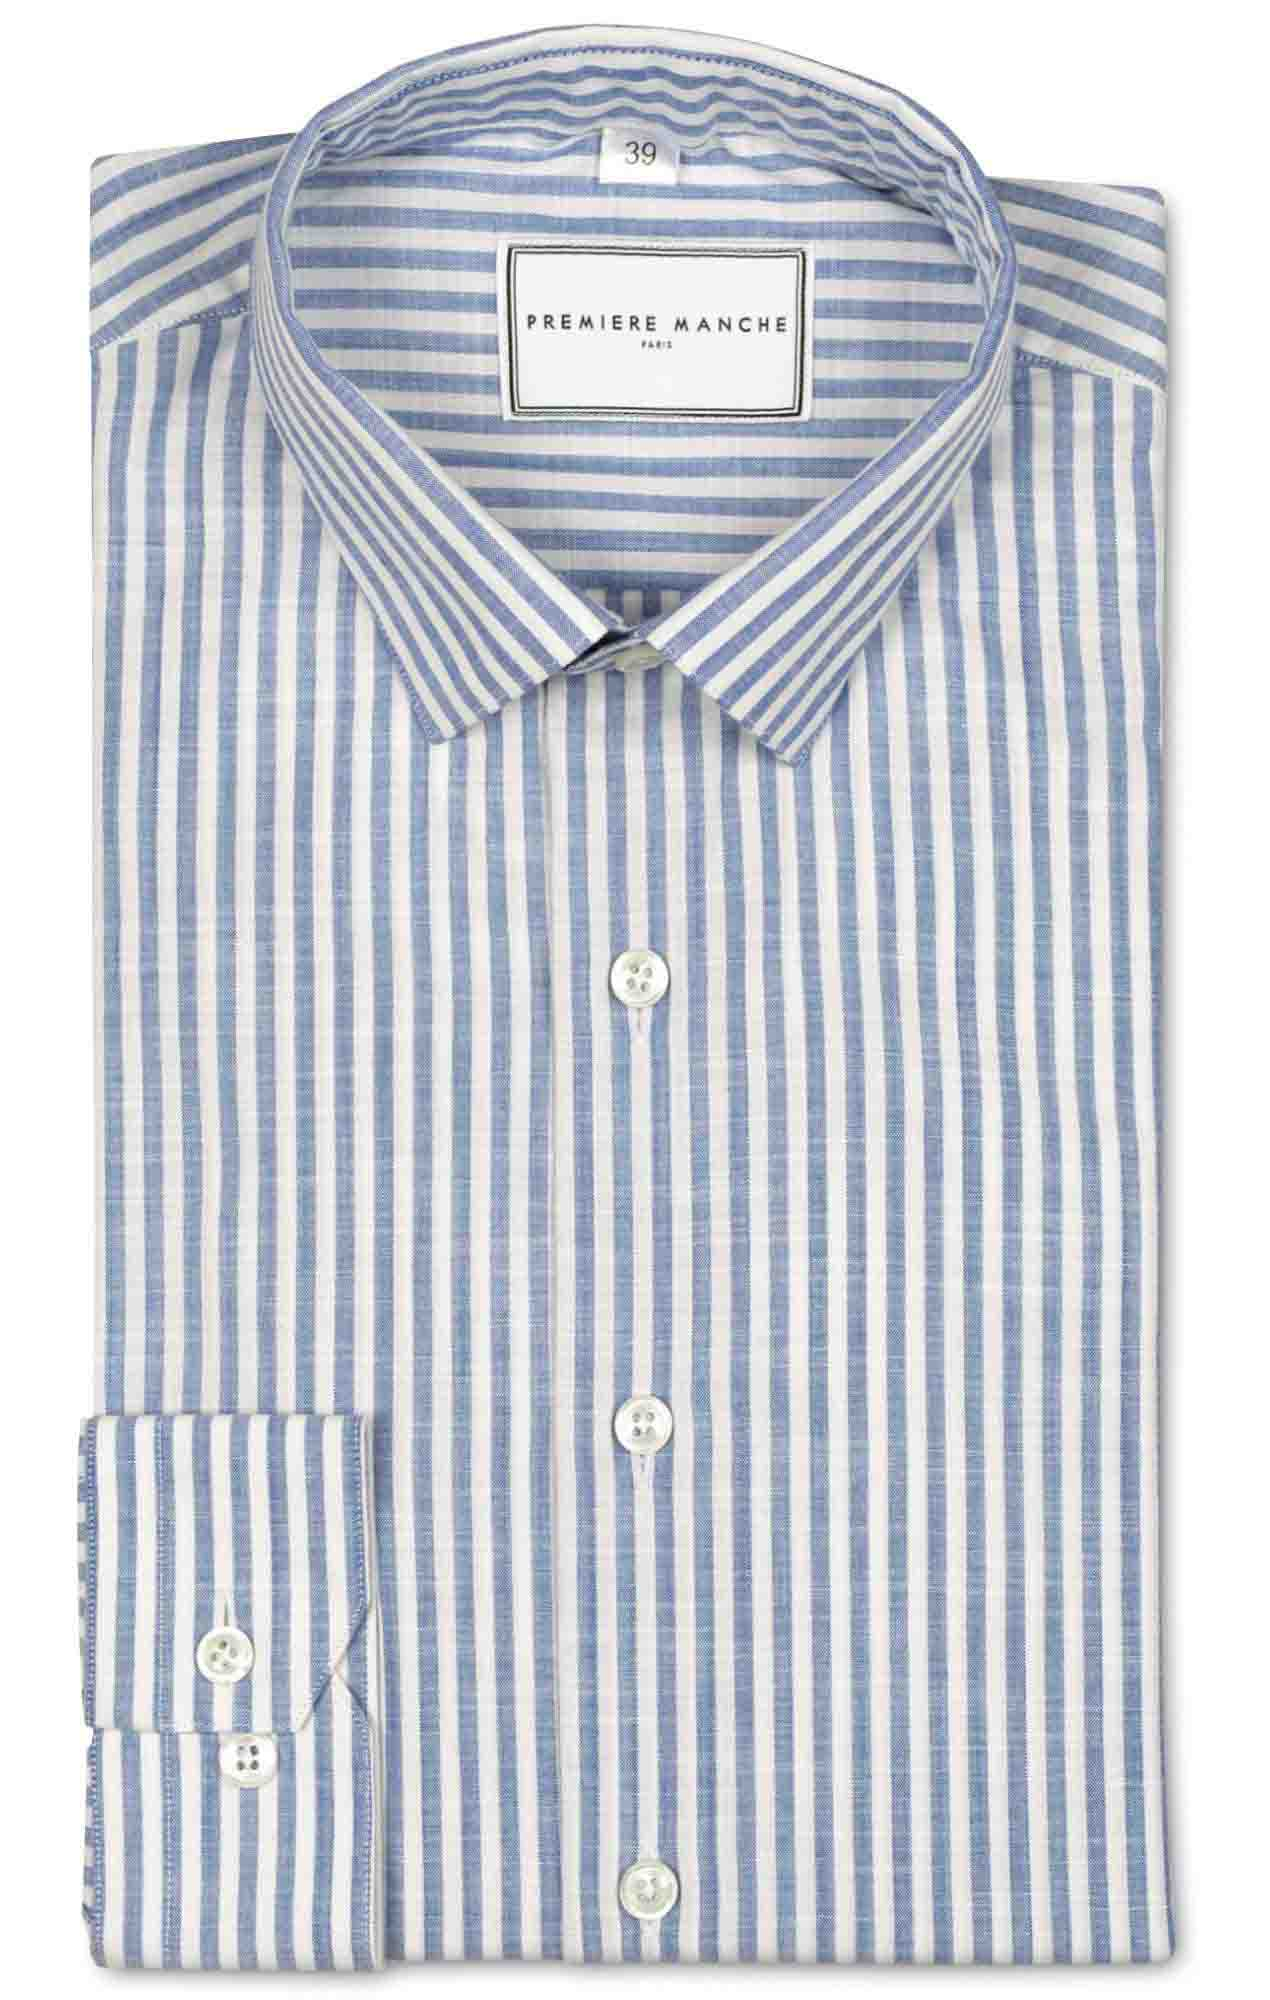 Blue striped chambray